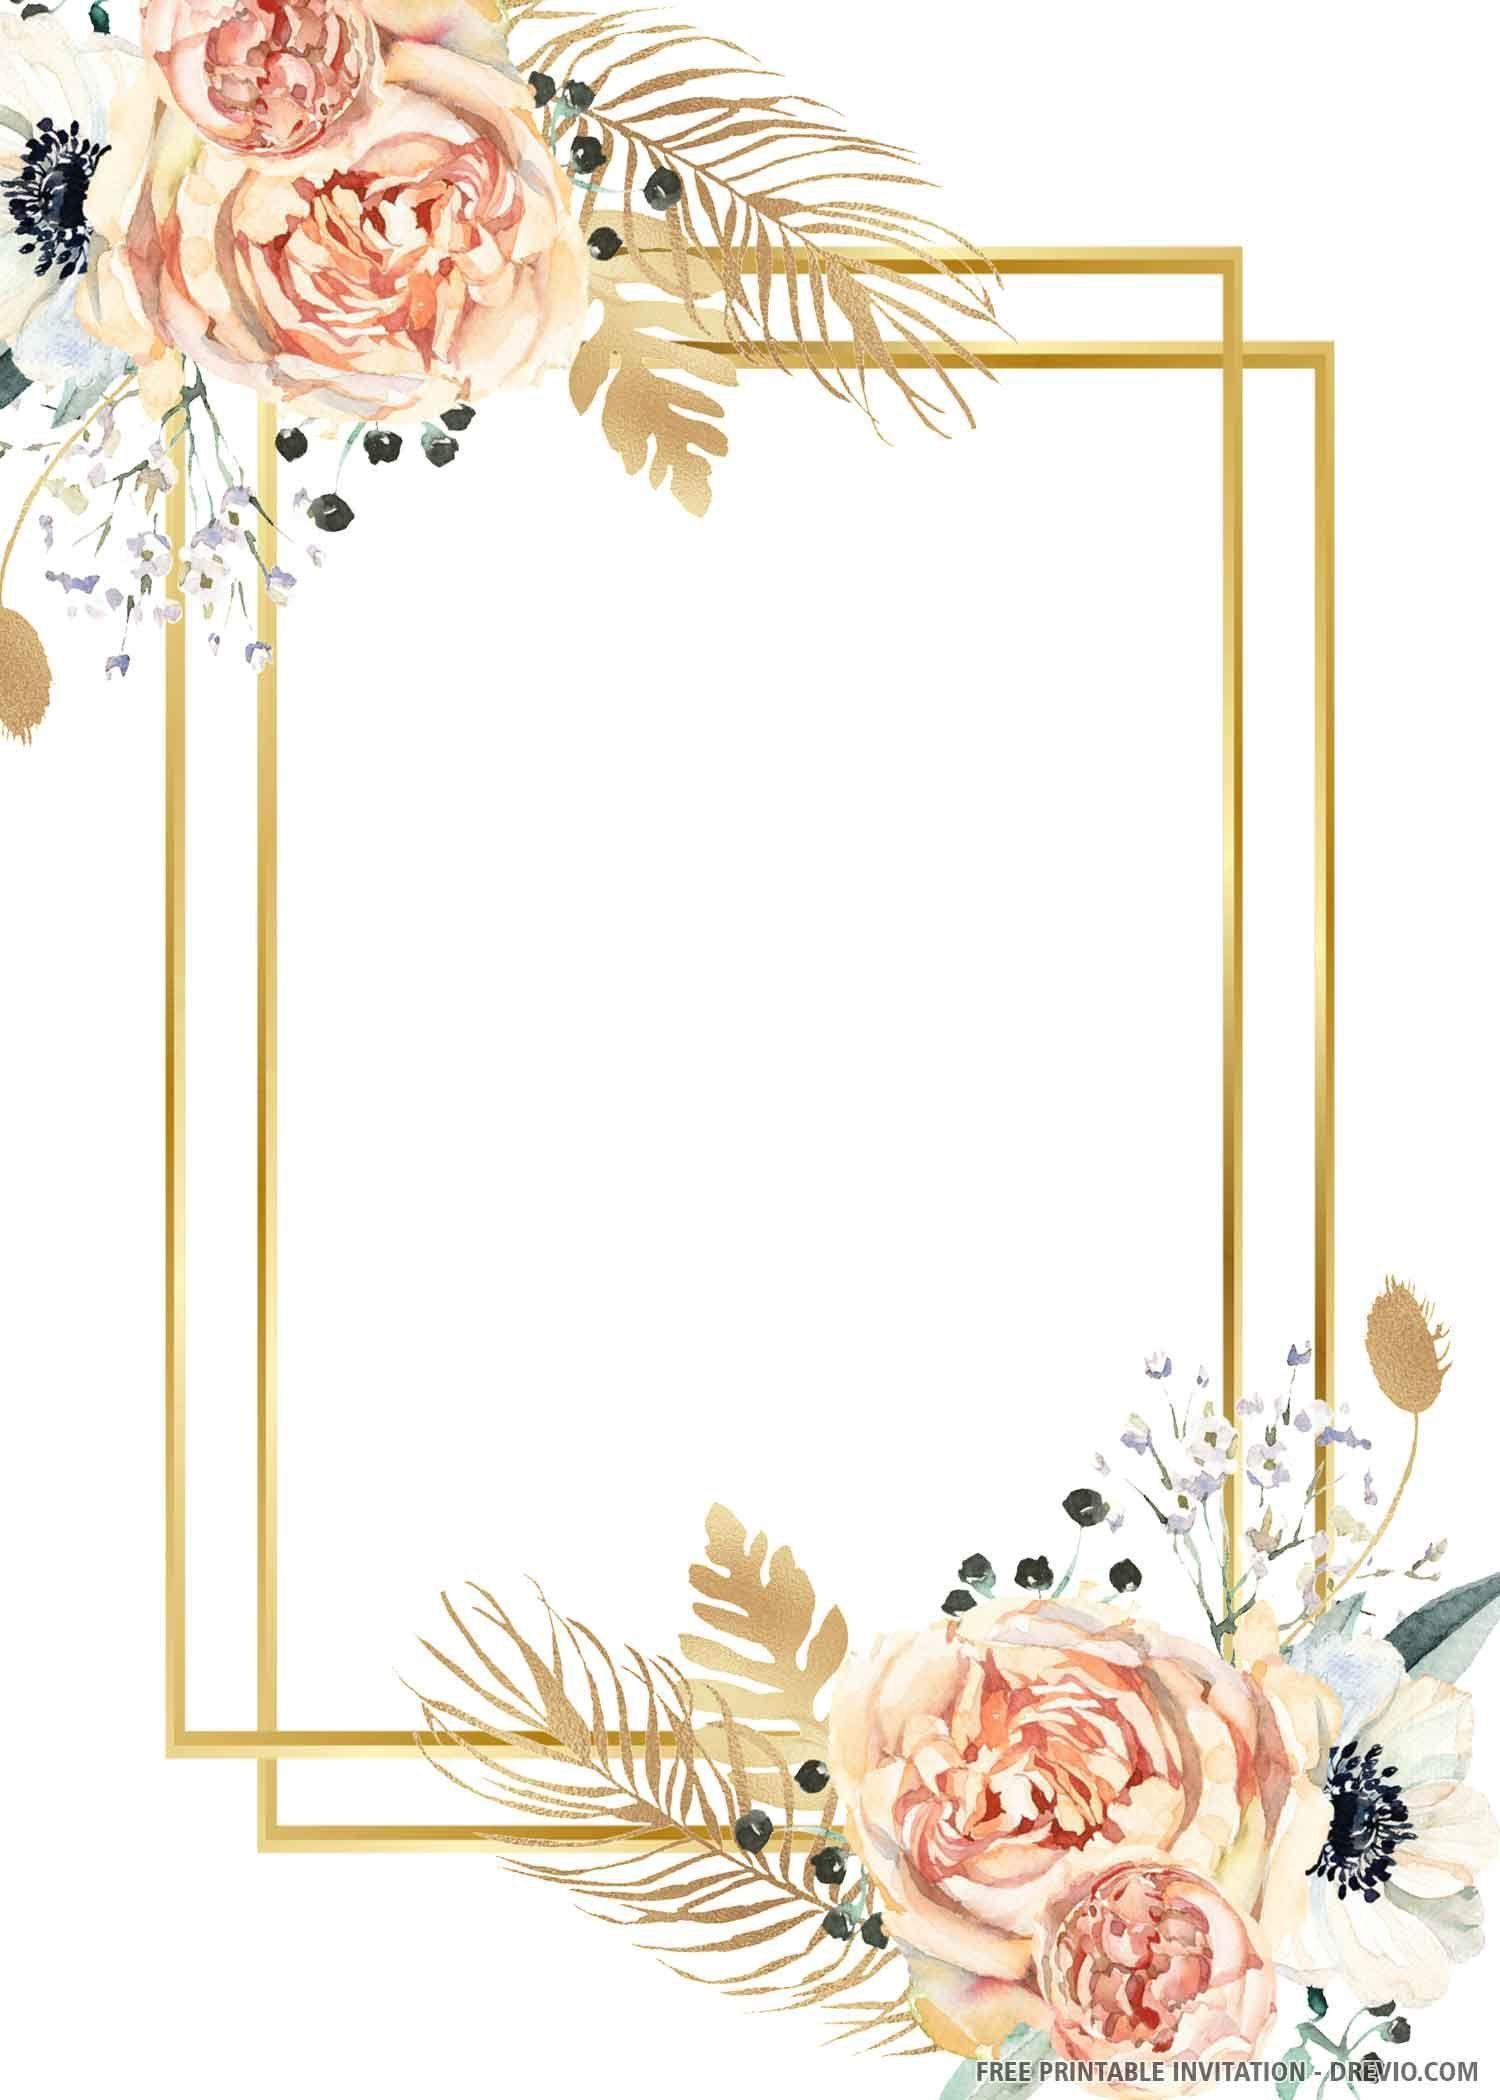 009 Stunning Free Invite Design Printable Example  Wedding Place Card Template Birthday To PrintFull